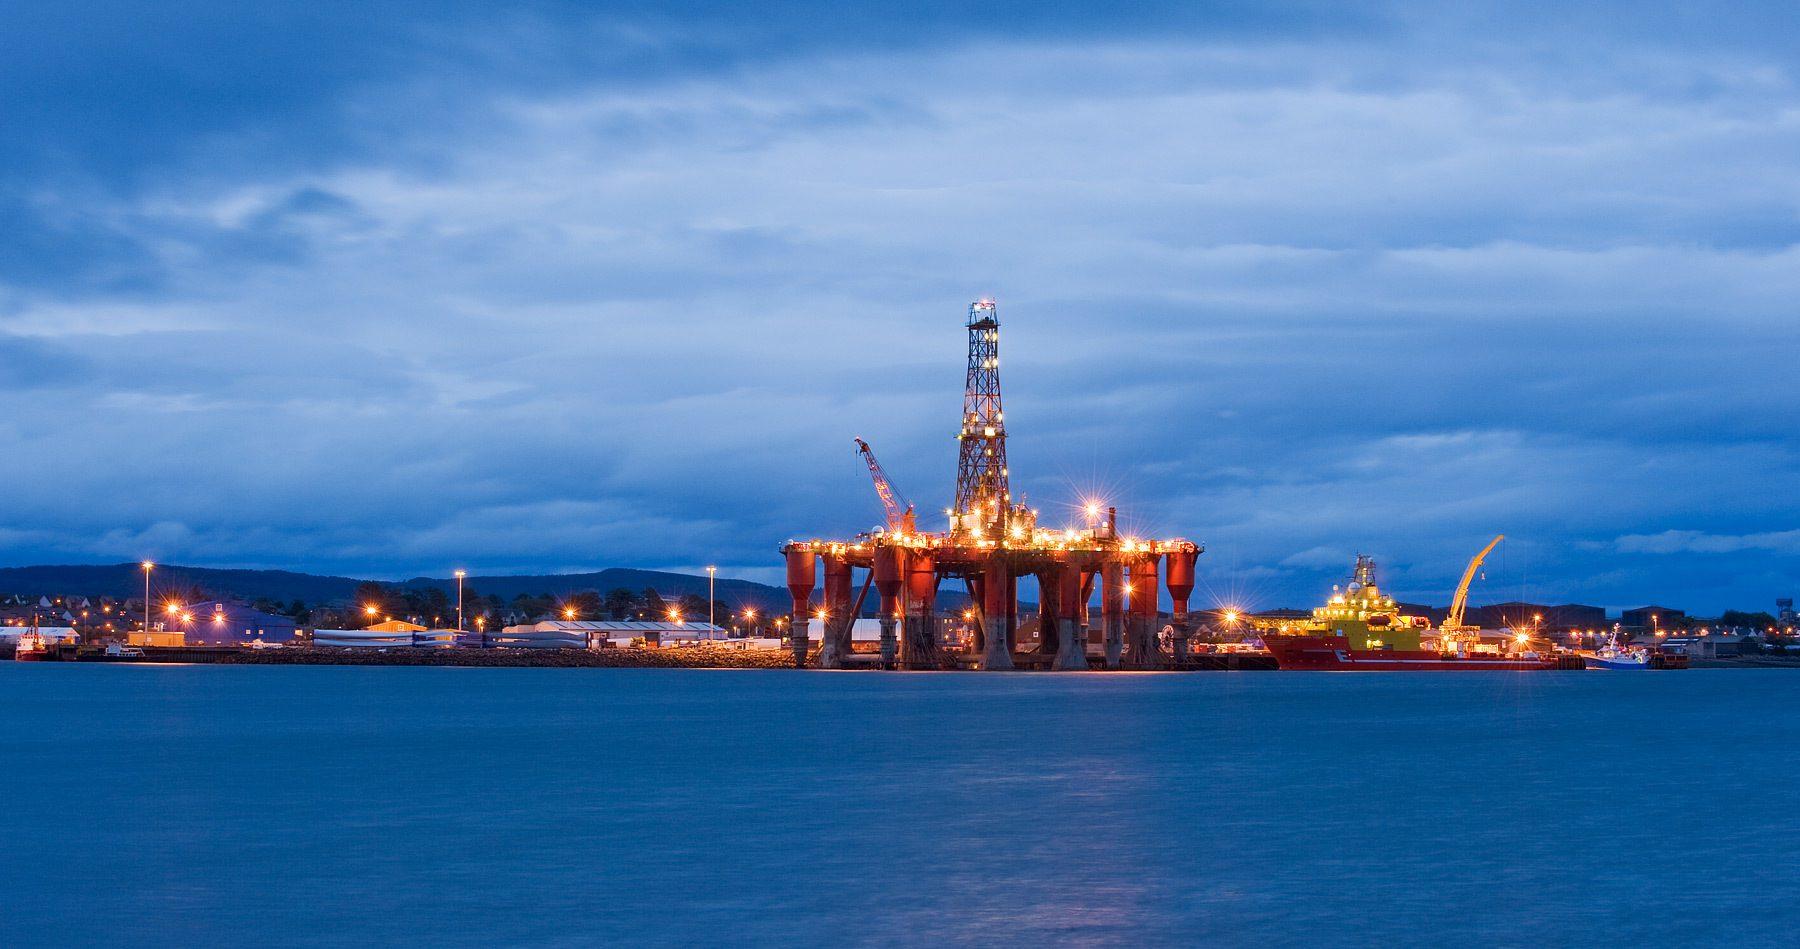 Oil rigs moored in Cromarty Firth. Invergordon, Scotland, UK